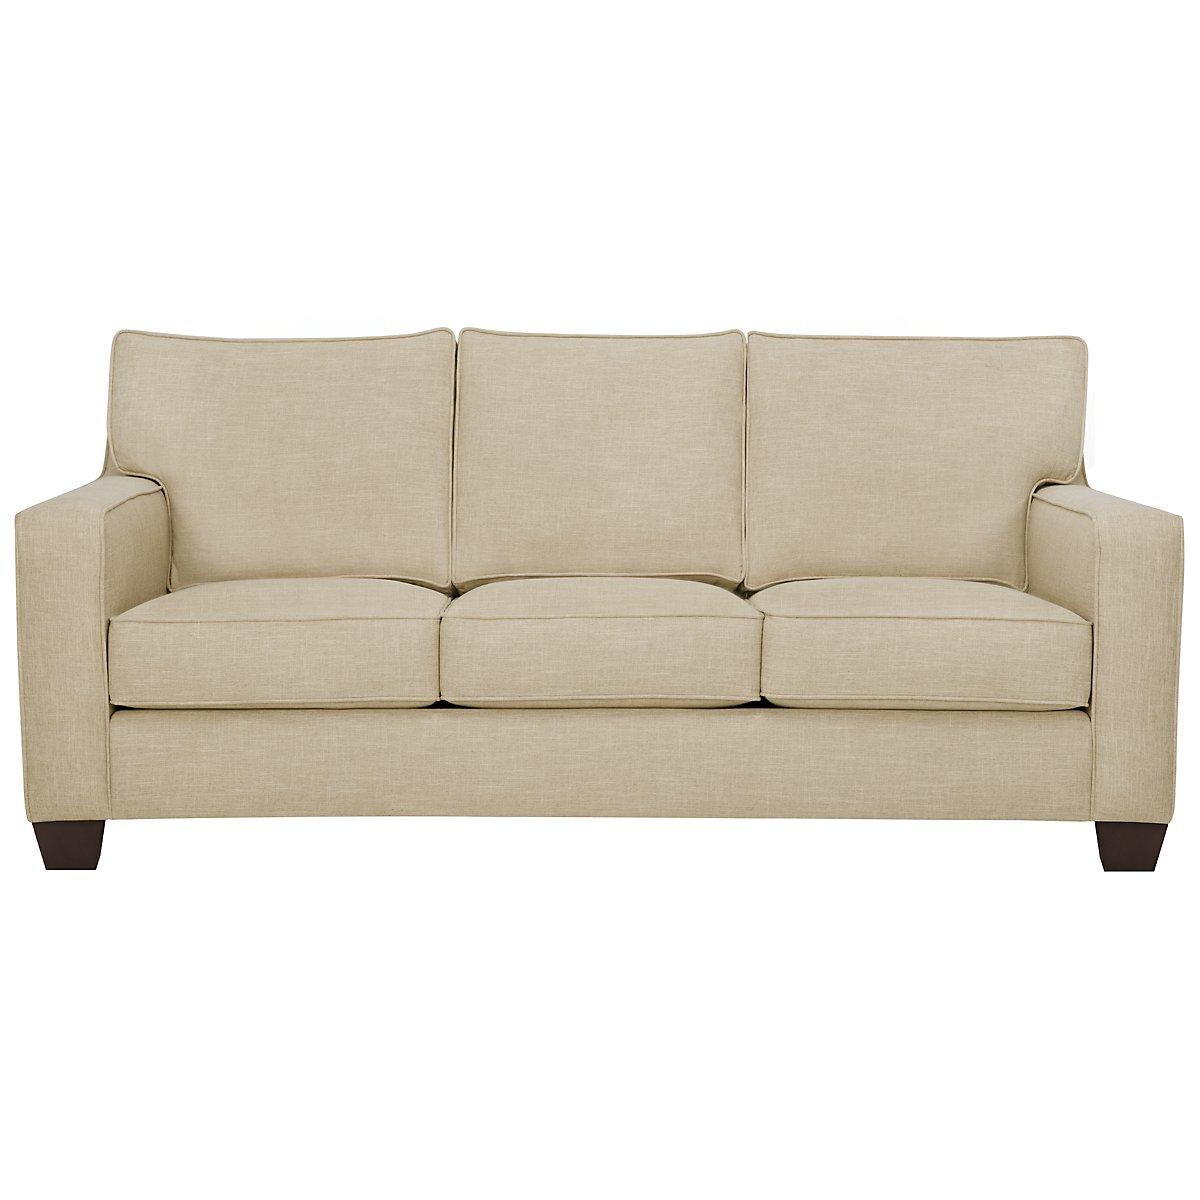 City Furniture York Beige Fabric Sofa